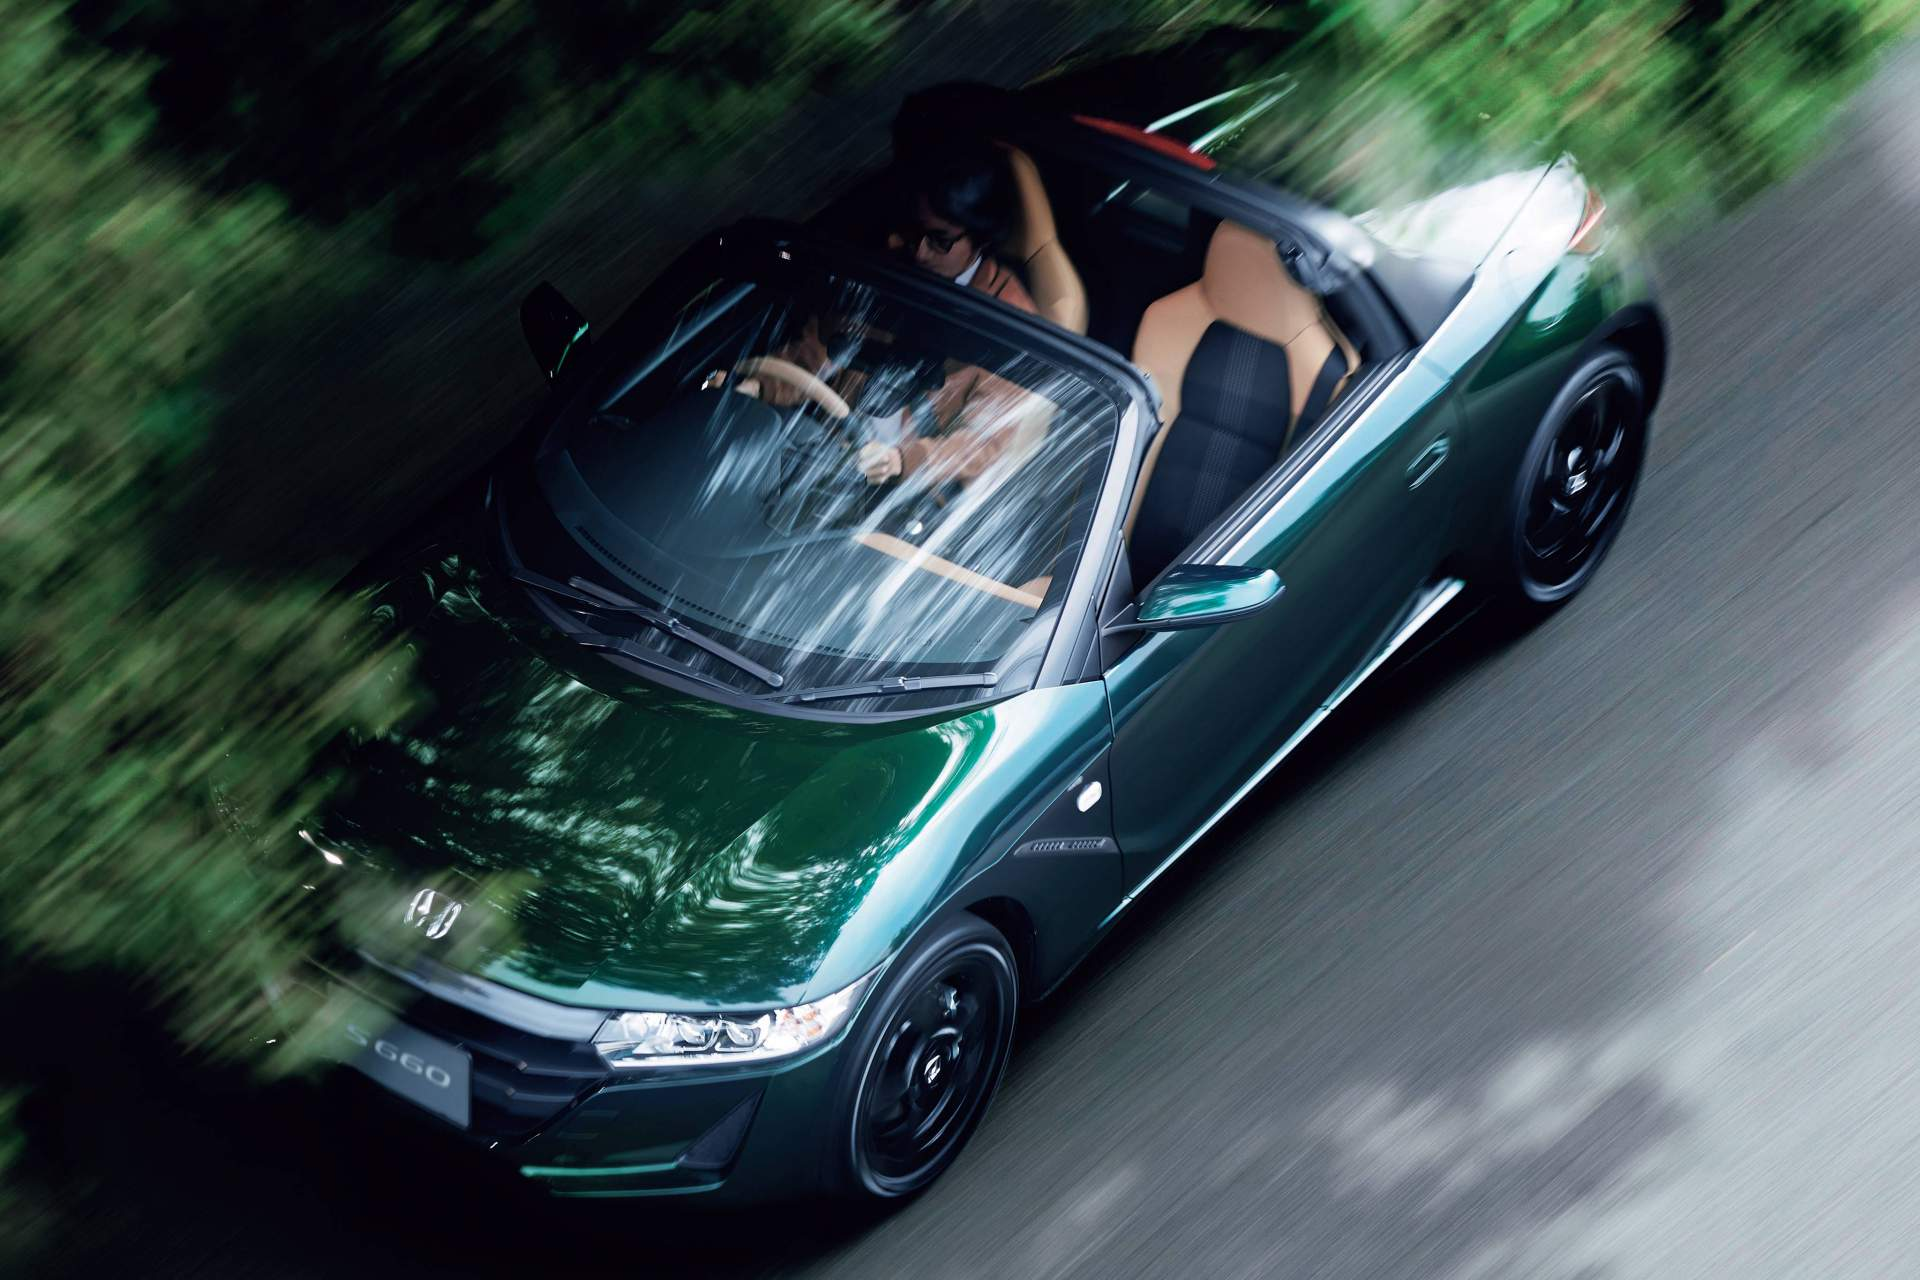 Honda_S660_Trad_Leather_Edition_0008